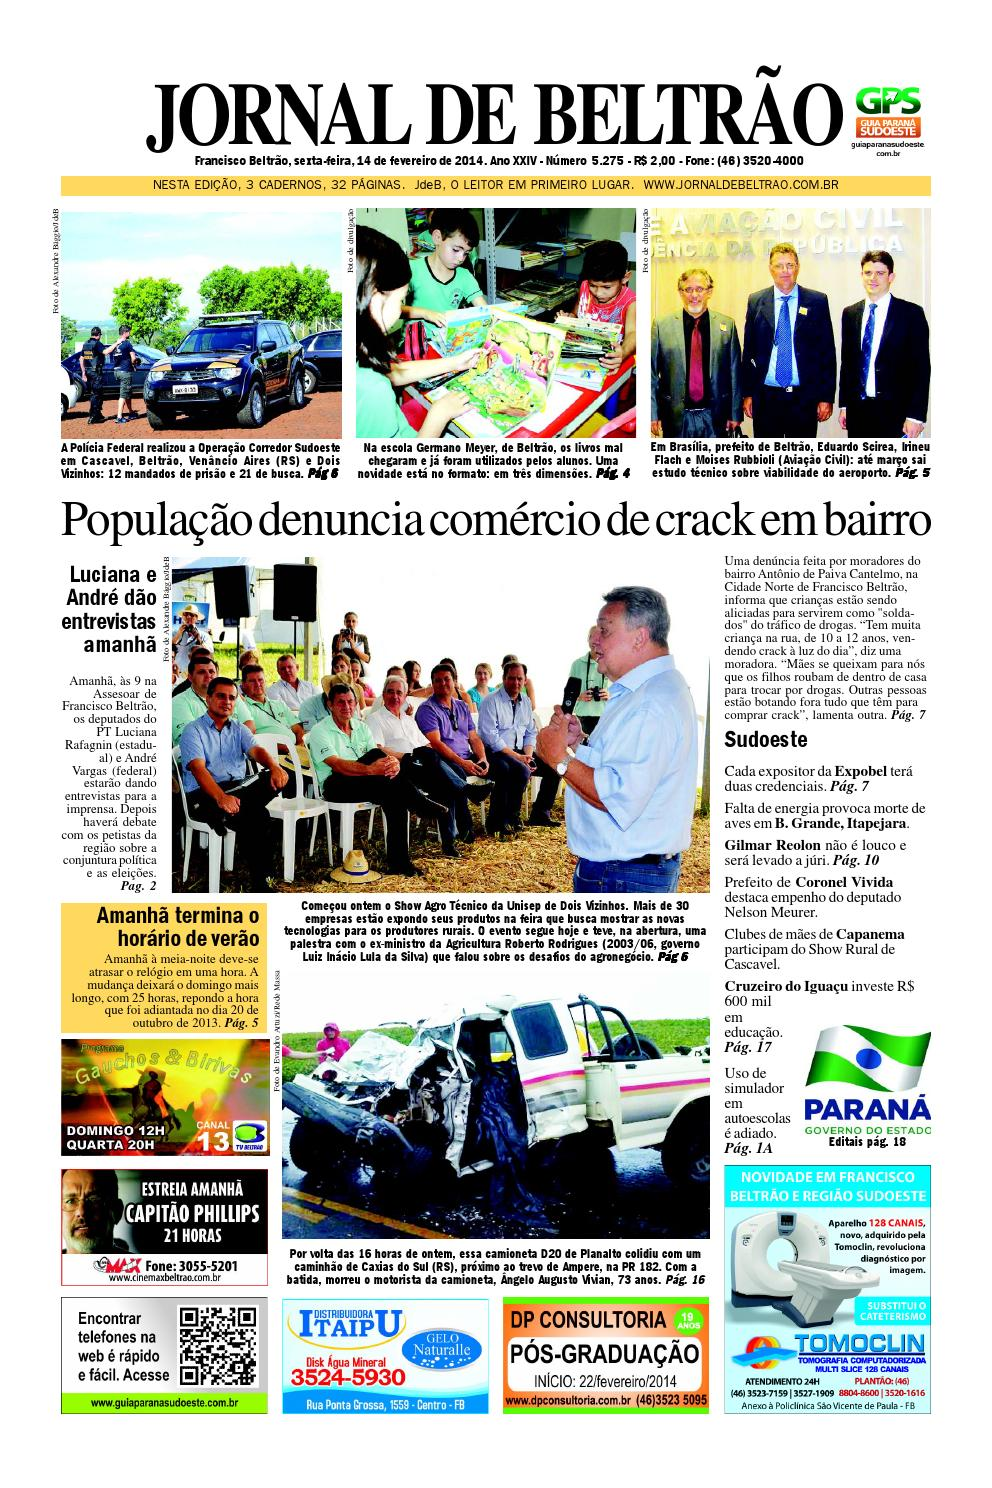 Jornaldebeltrão 5275 2014 02 14 by Orangotoe - issuu 2ca13d9acee88